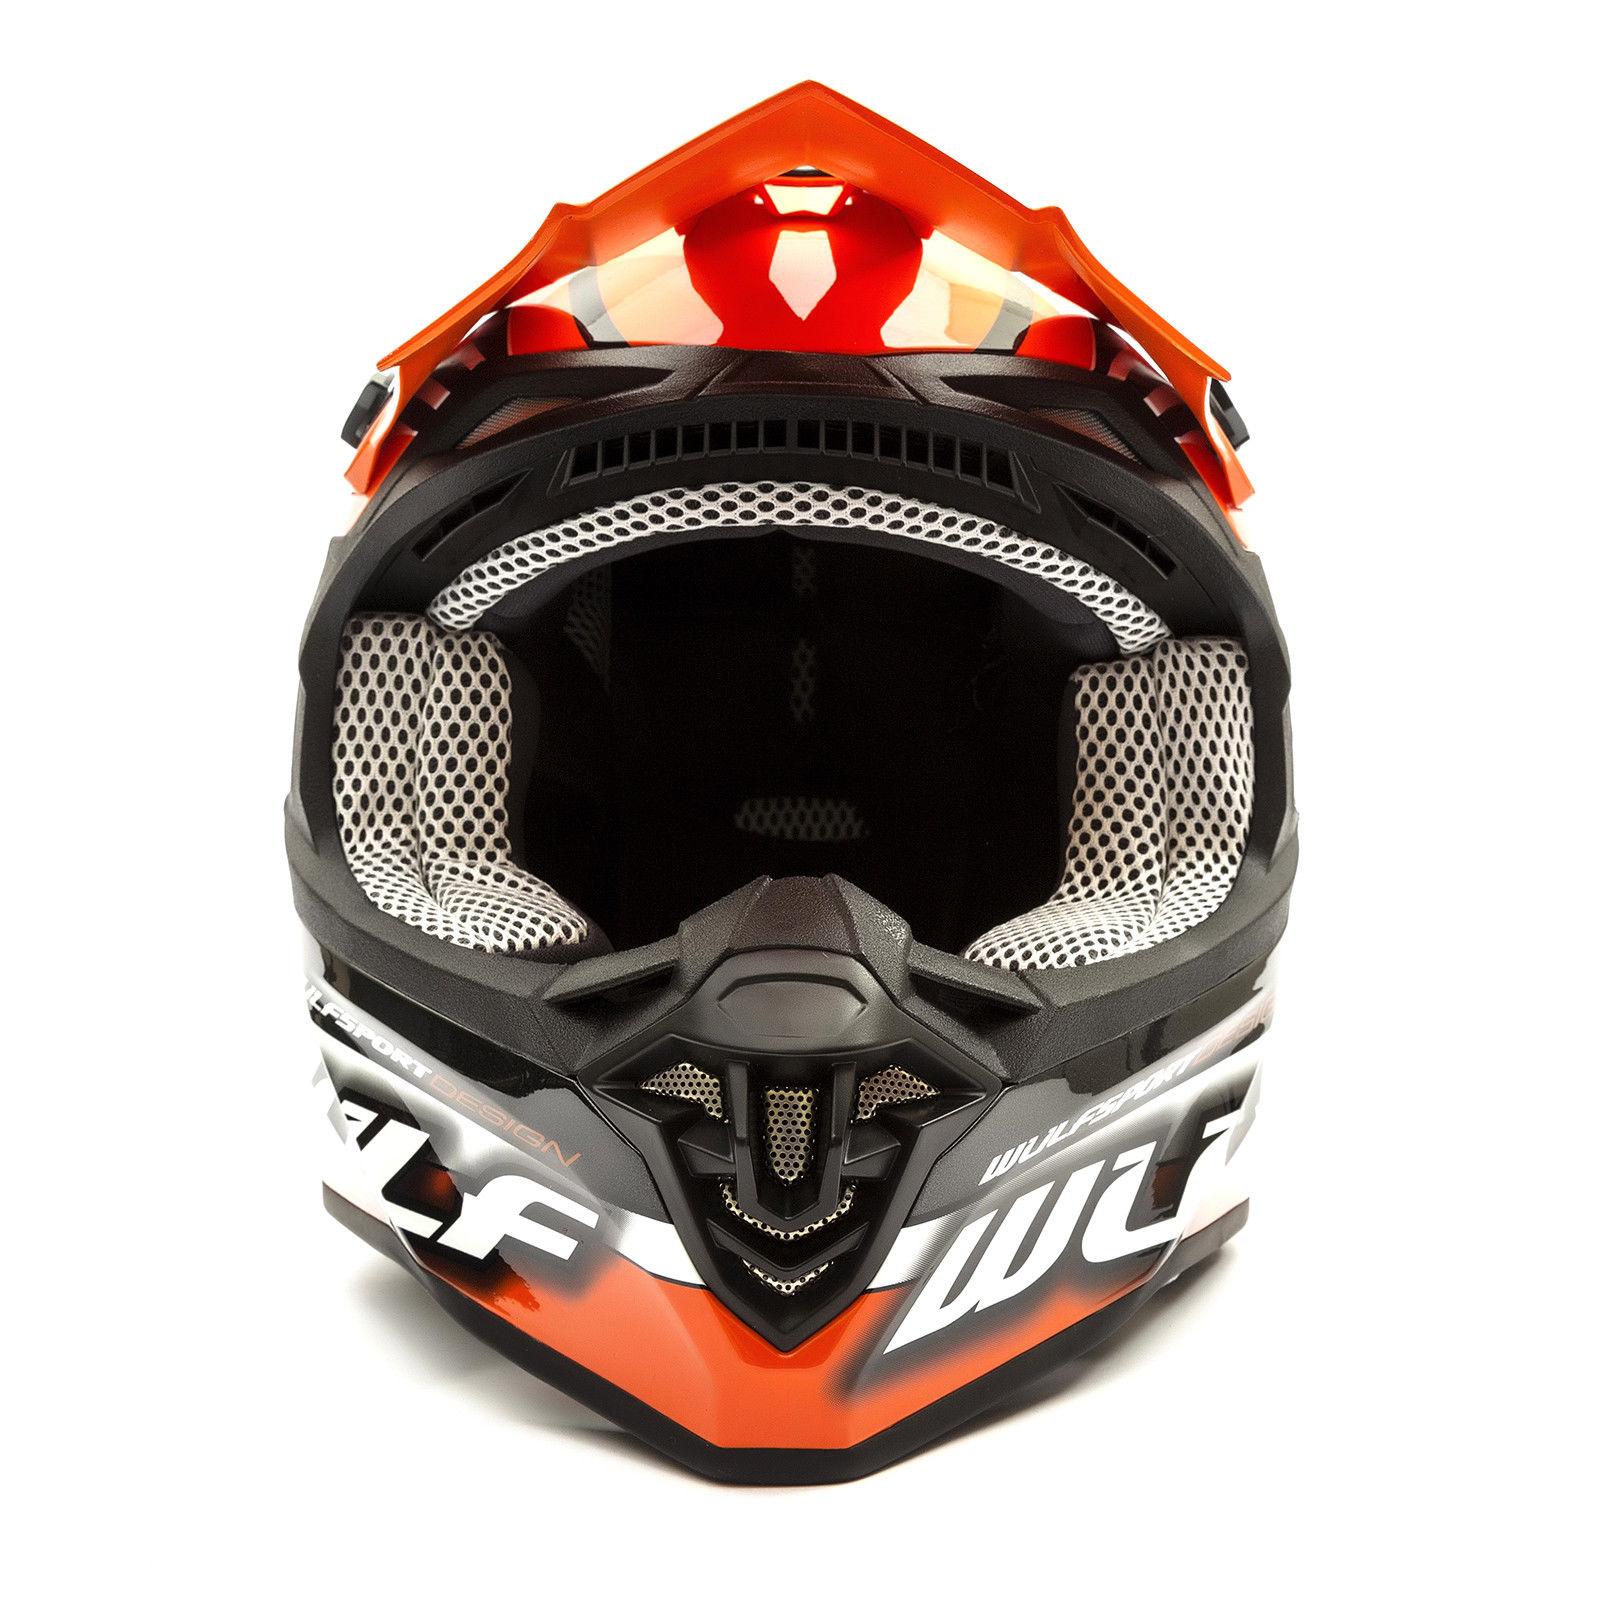 Wulfsport-Adult-Sceptre-Helmets-Motocross-Pitbike-Motorbike-Off-Road-Racing-ATV thumbnail 86